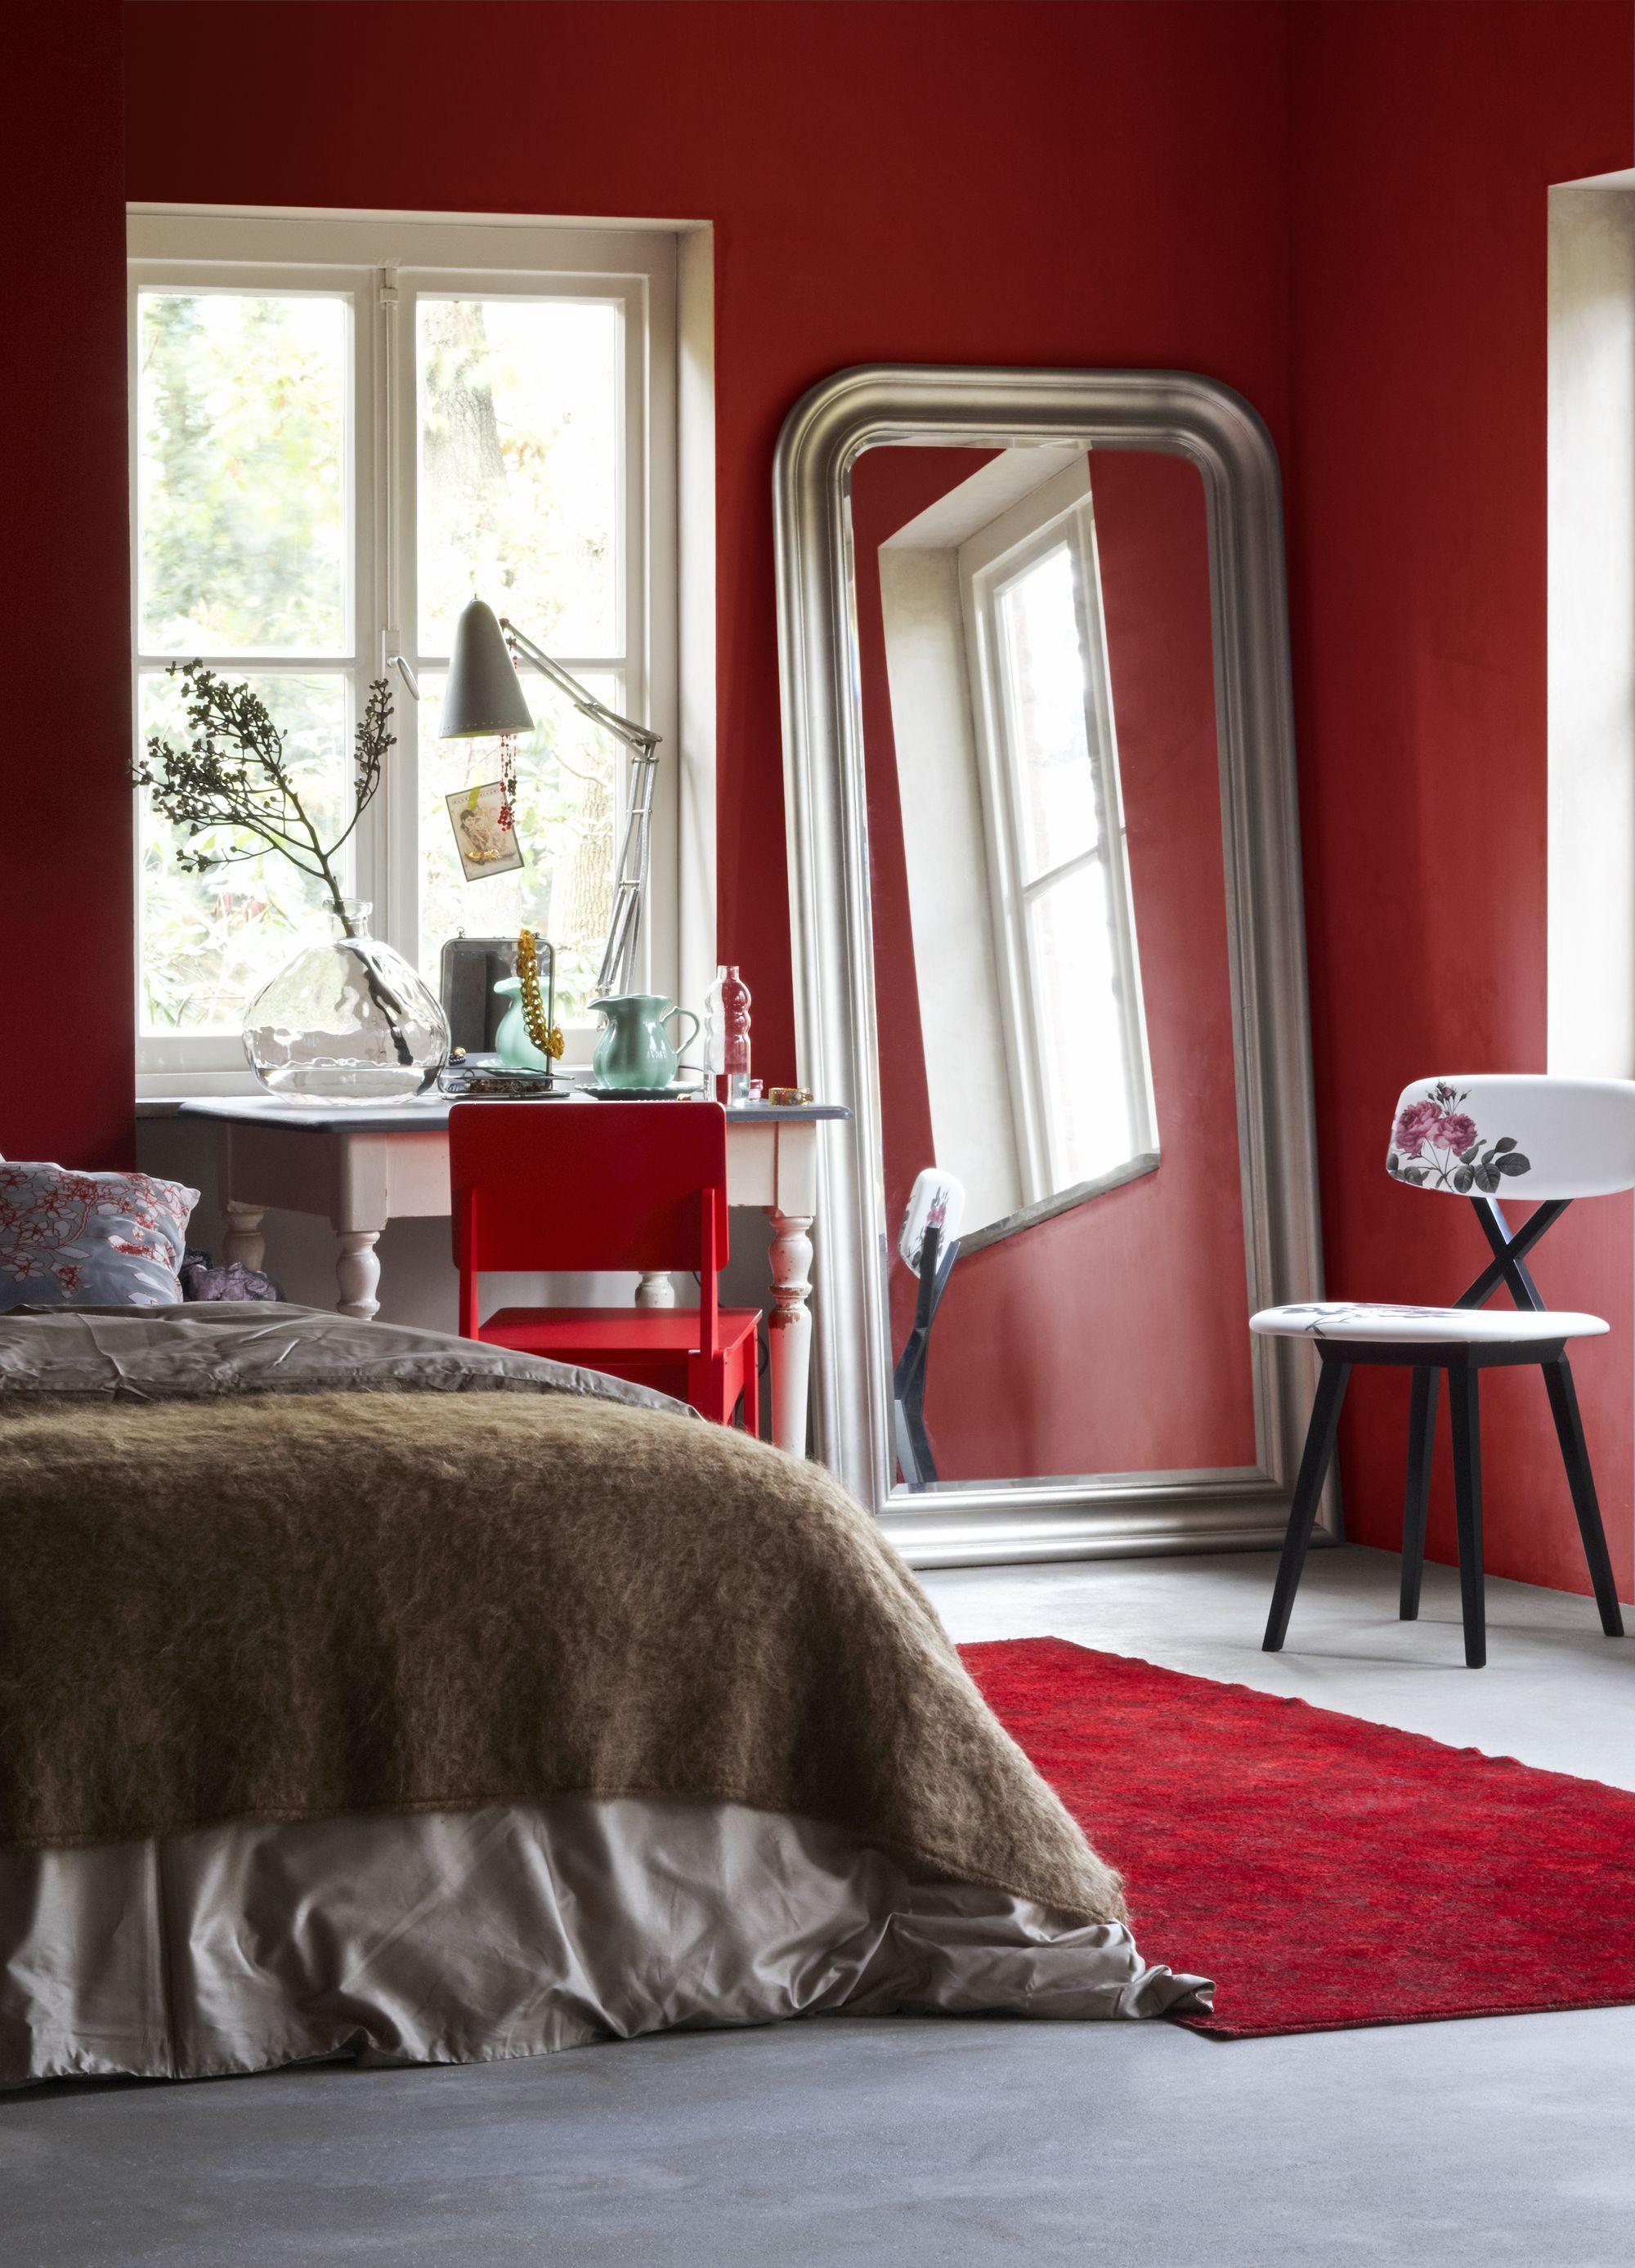 rode slaapkamer - rood in huis...bloempotten | For the Home ...